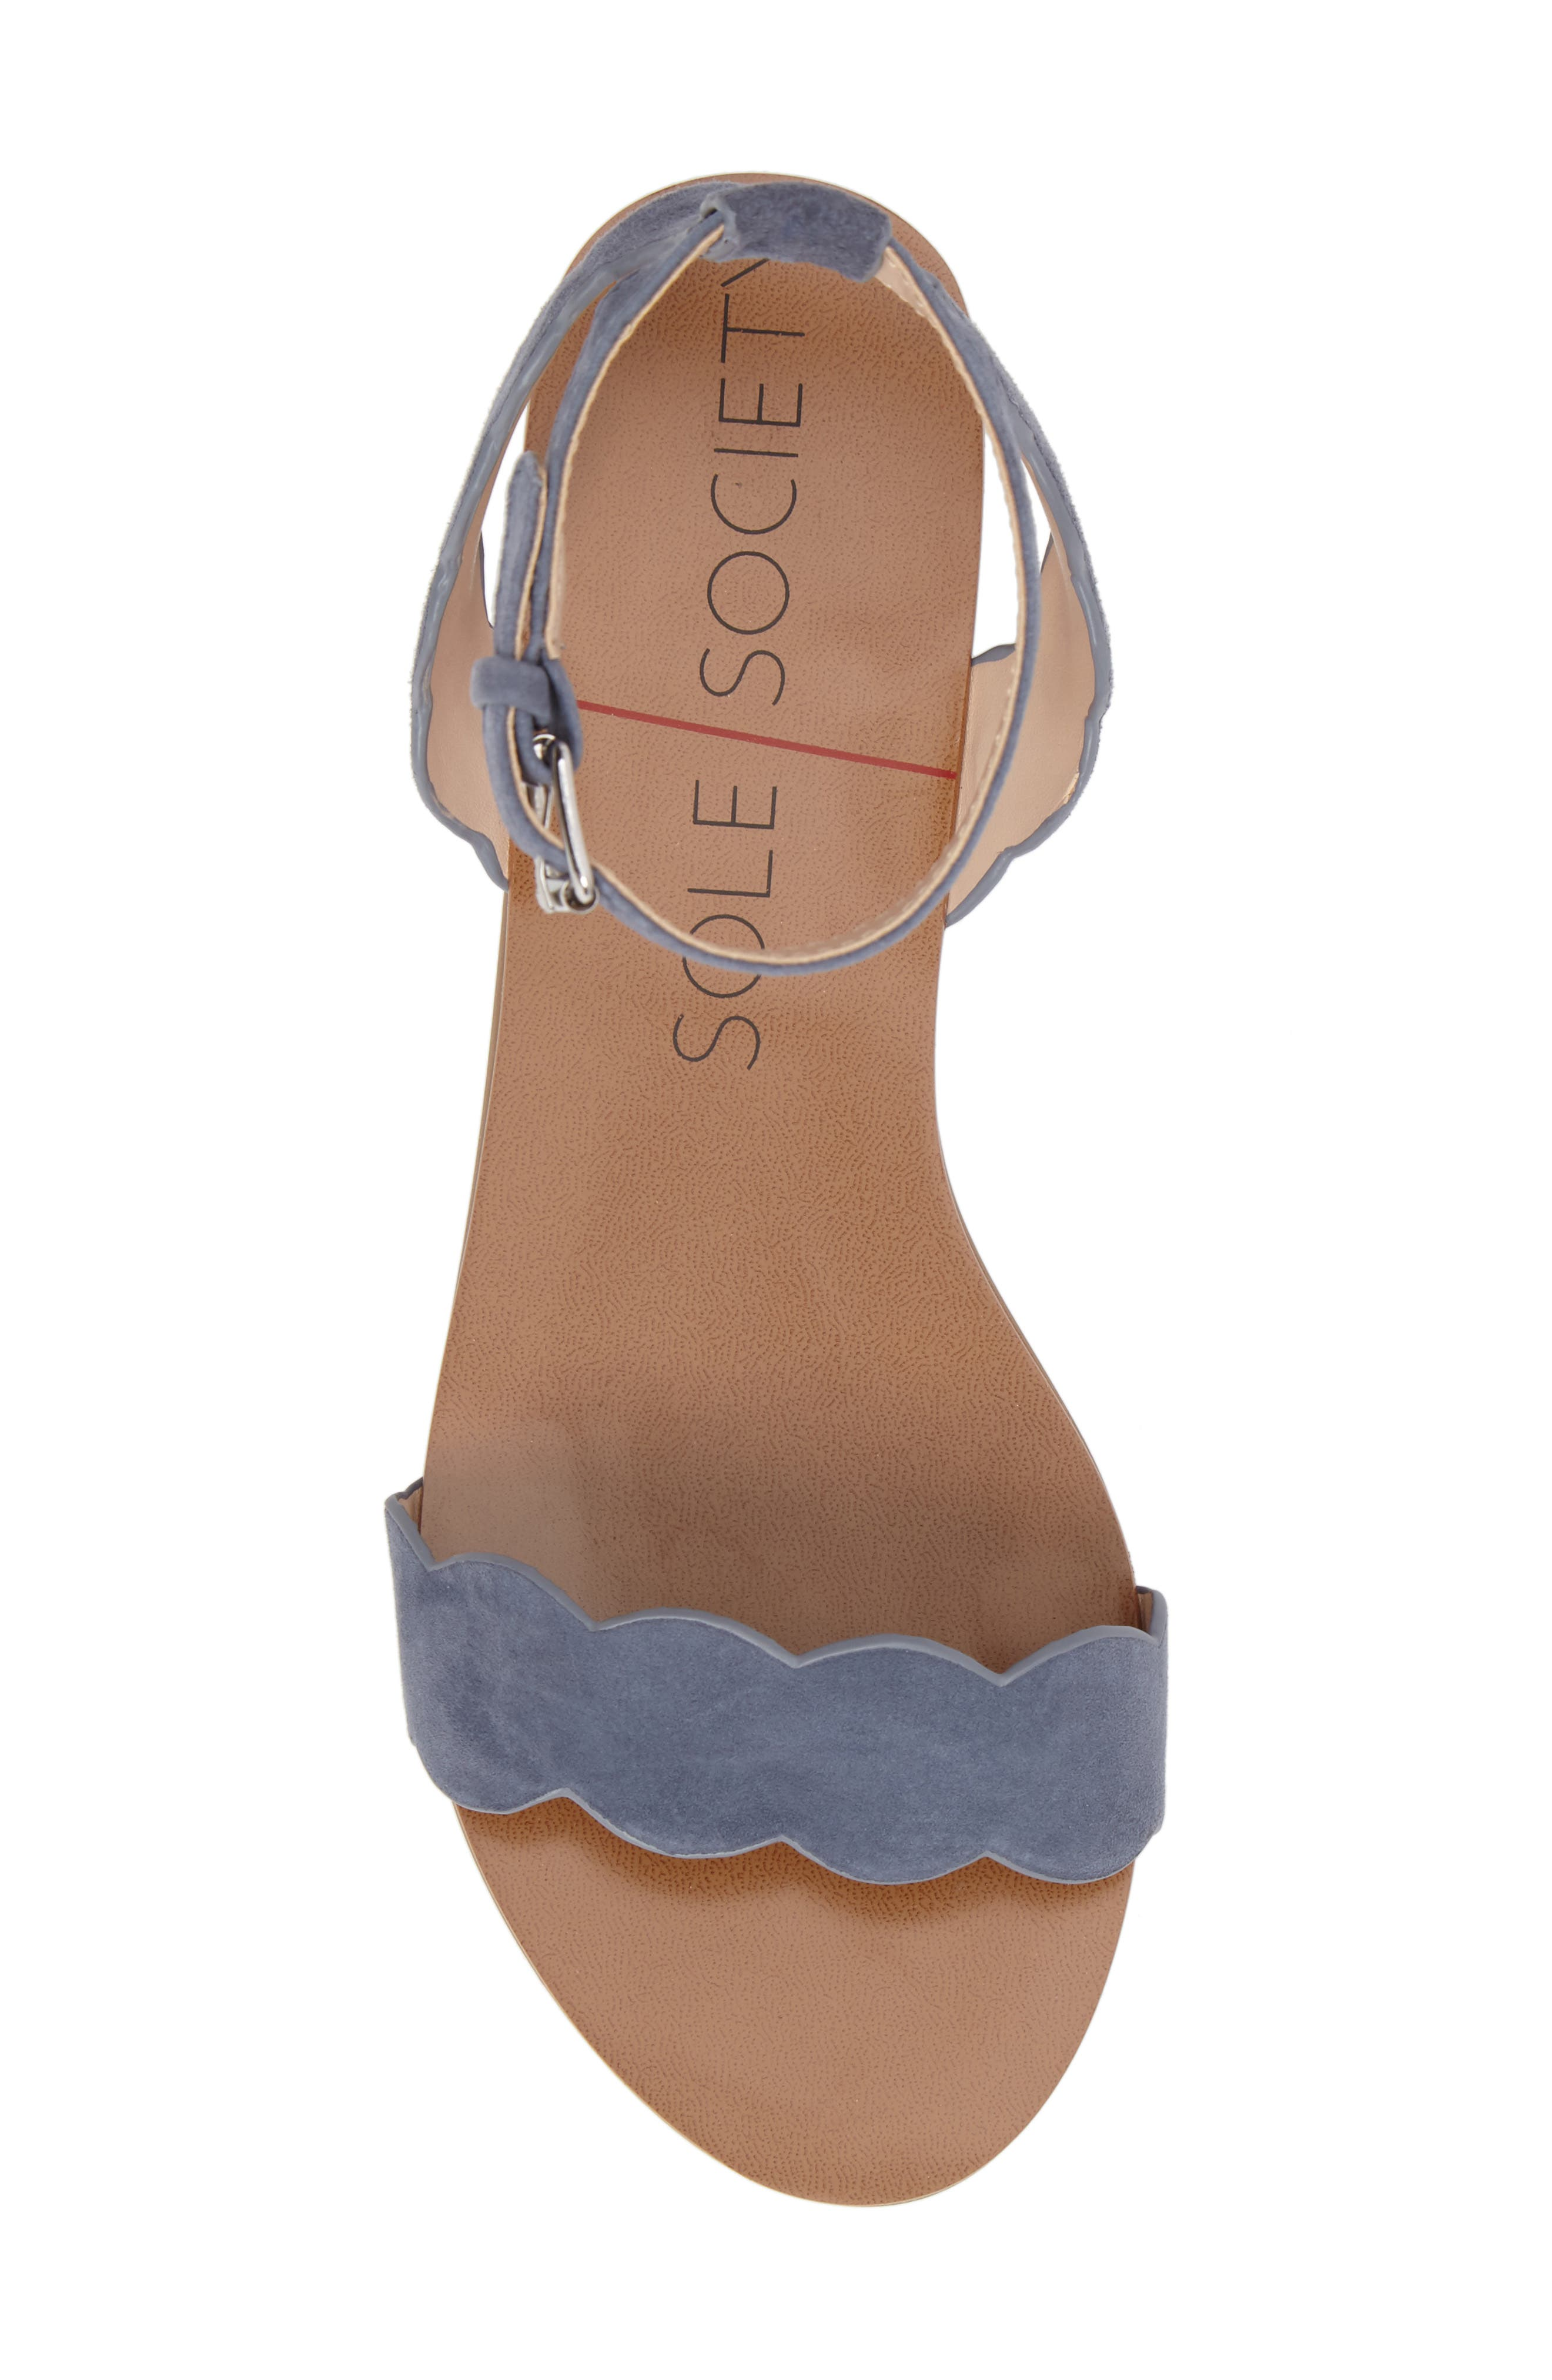 'Odette' Scalloped Ankle Strap Flat Sandal,                             Alternate thumbnail 31, color,